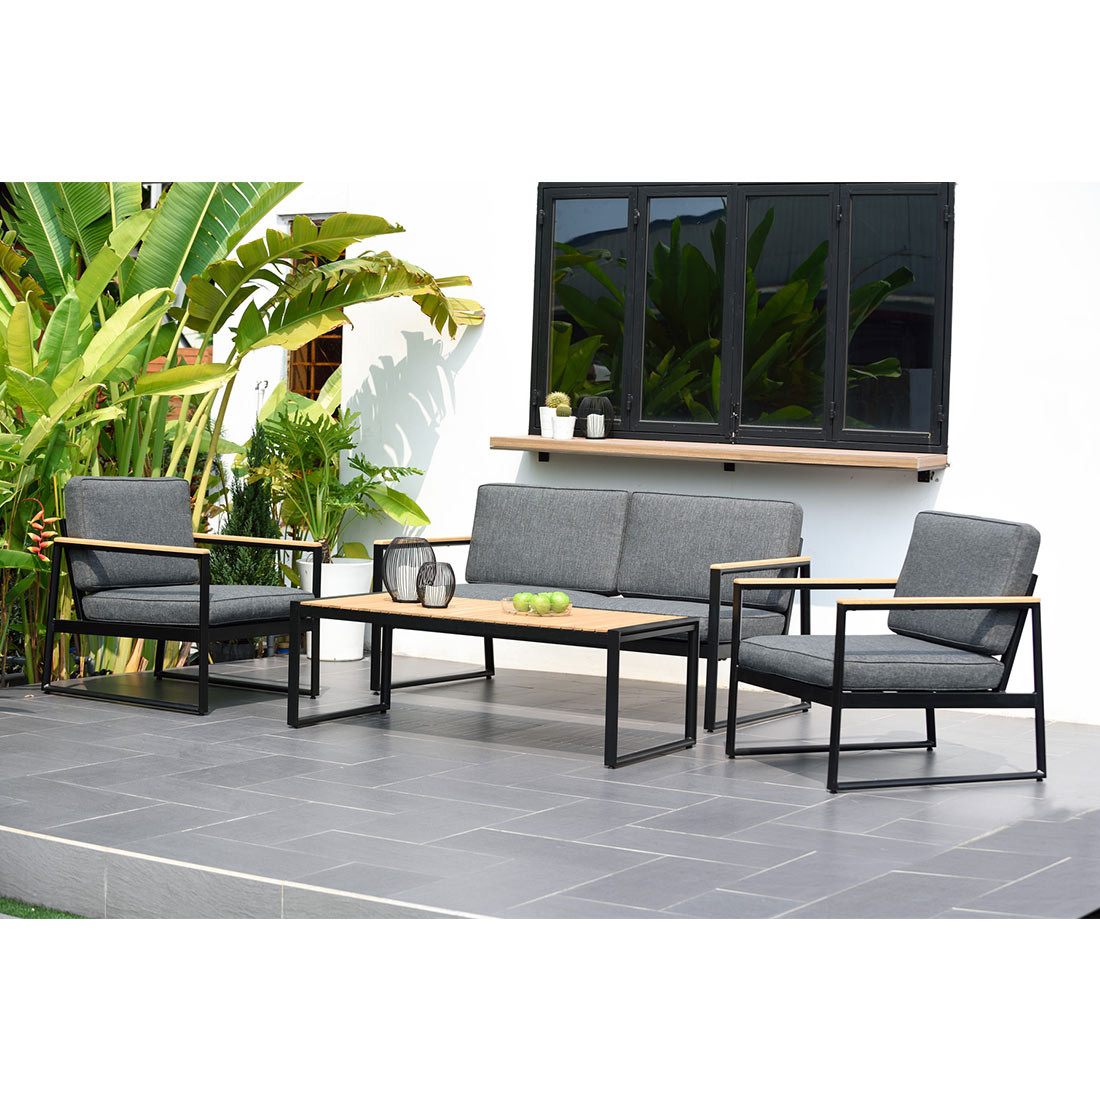 Scancom 4-tlg. Lounge-Set Porto-Rotondo 2805100060